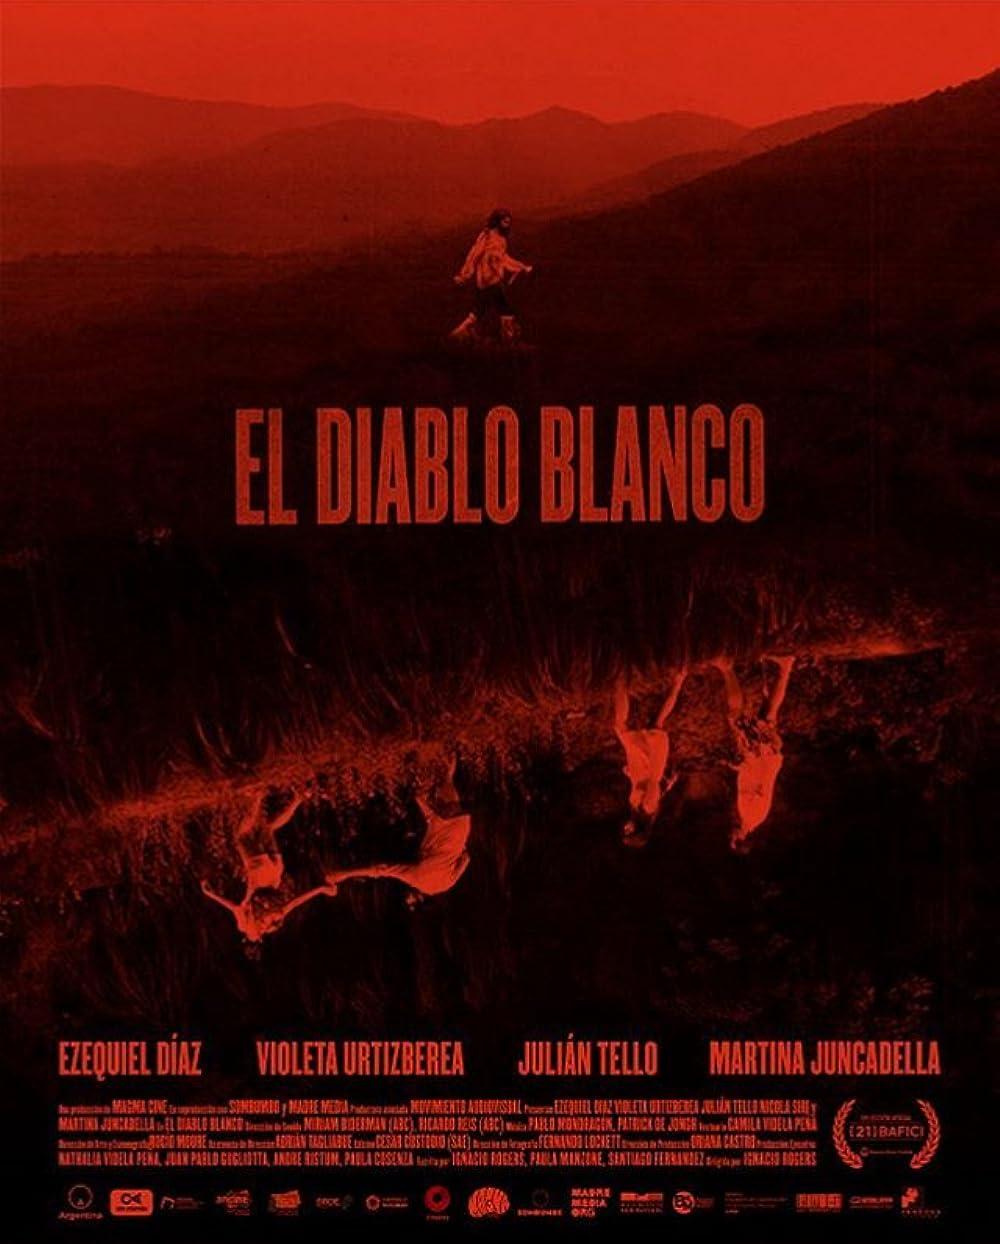 Download Filme O Diabo Branco Qualidade Hd